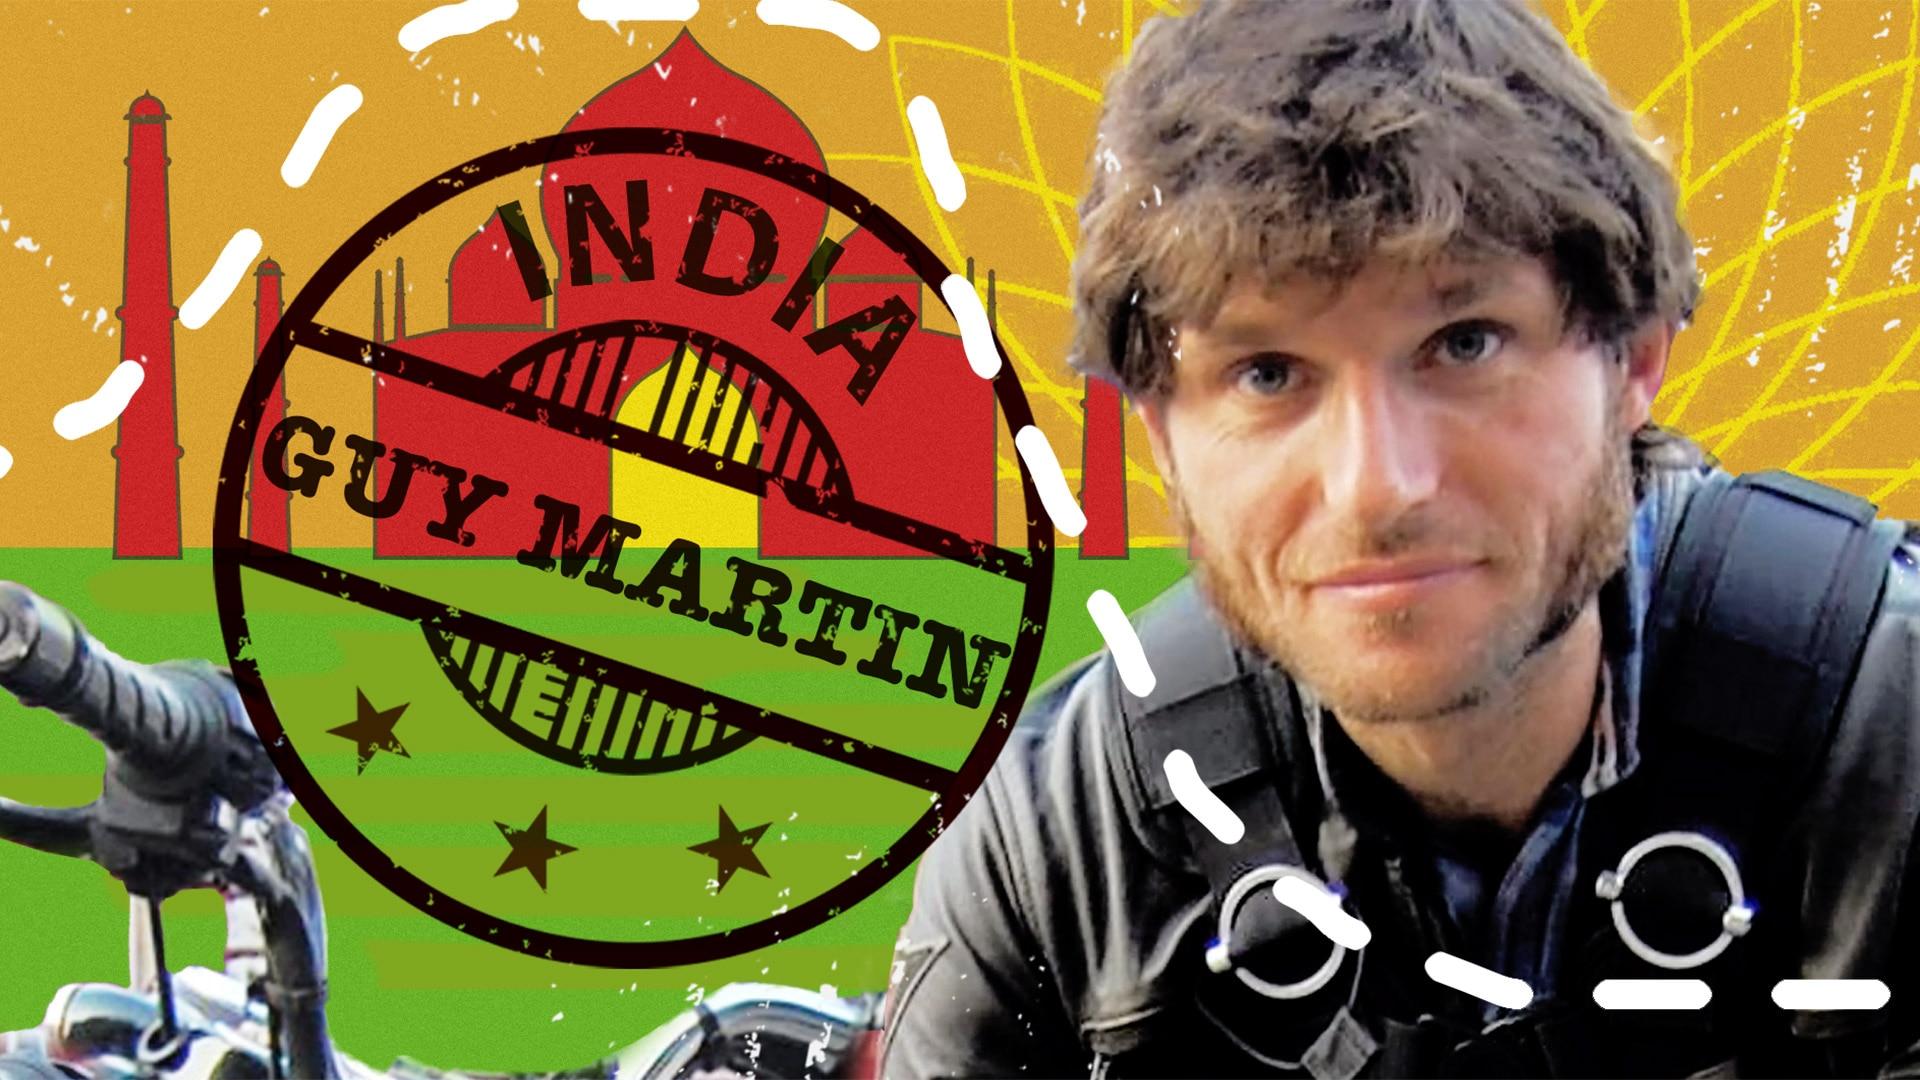 India Guy Martin